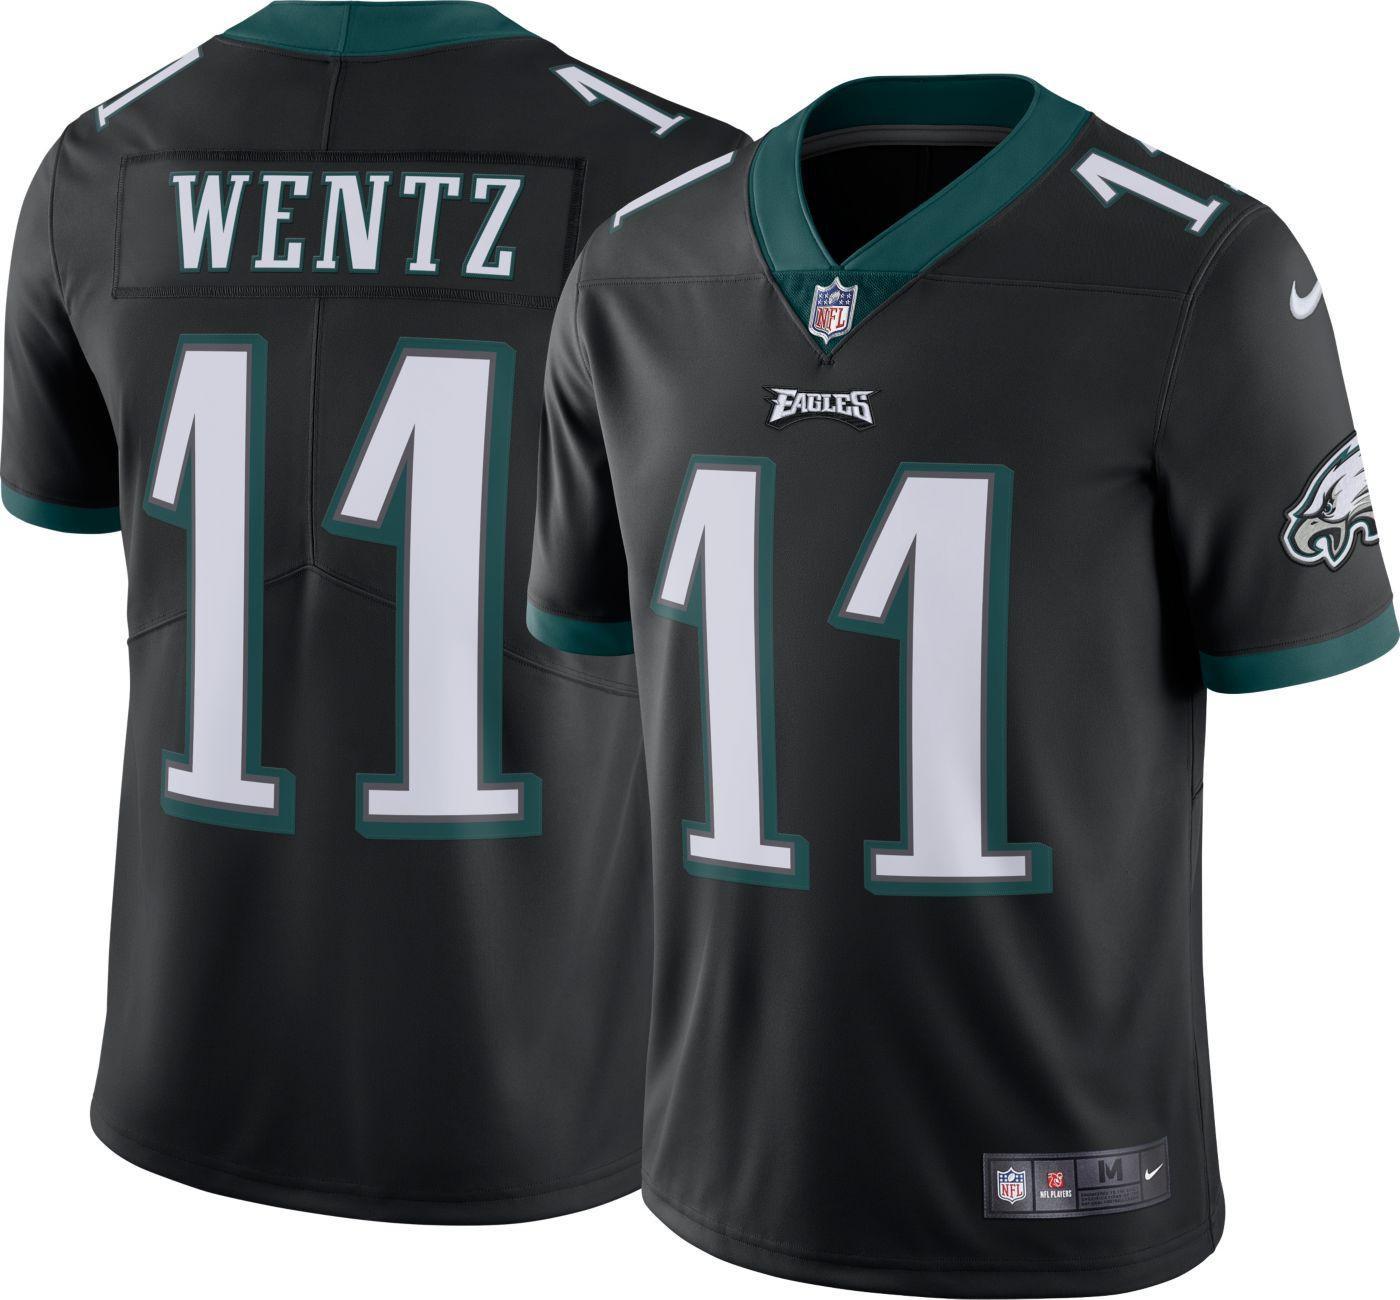 Nike Men's Alternate Limited Jersey Philadelphia Eagles Carson Wentz #11